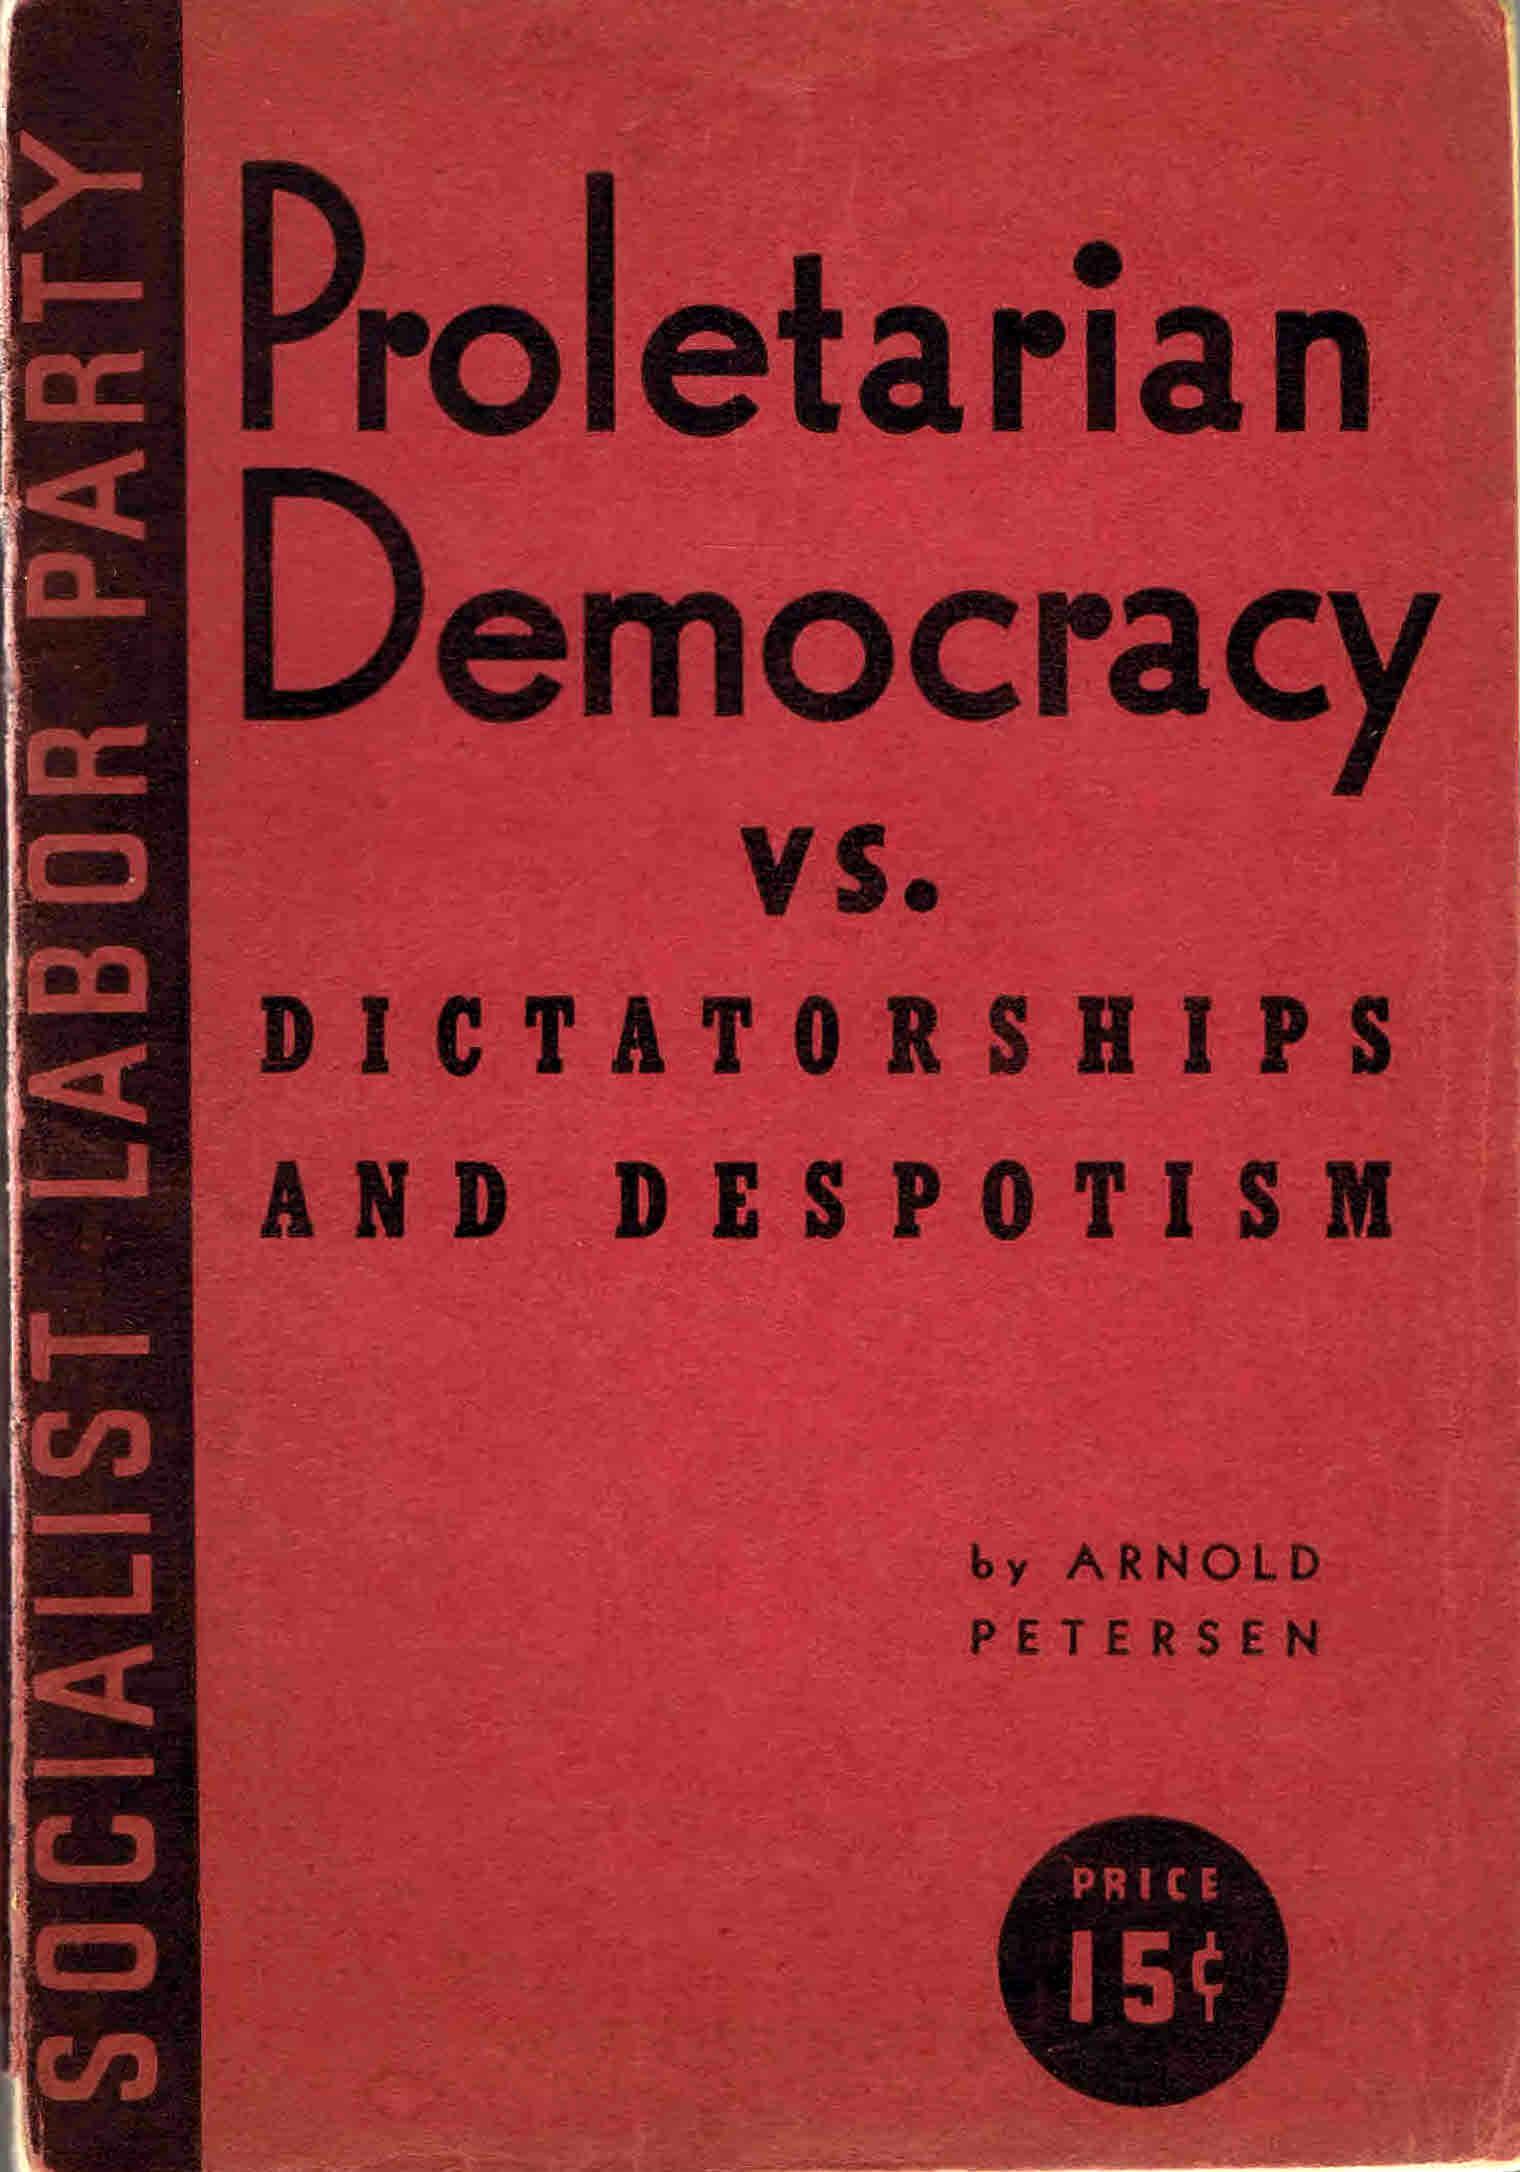 proletarian democracy vs dictatorship and despotism, arnold petersen